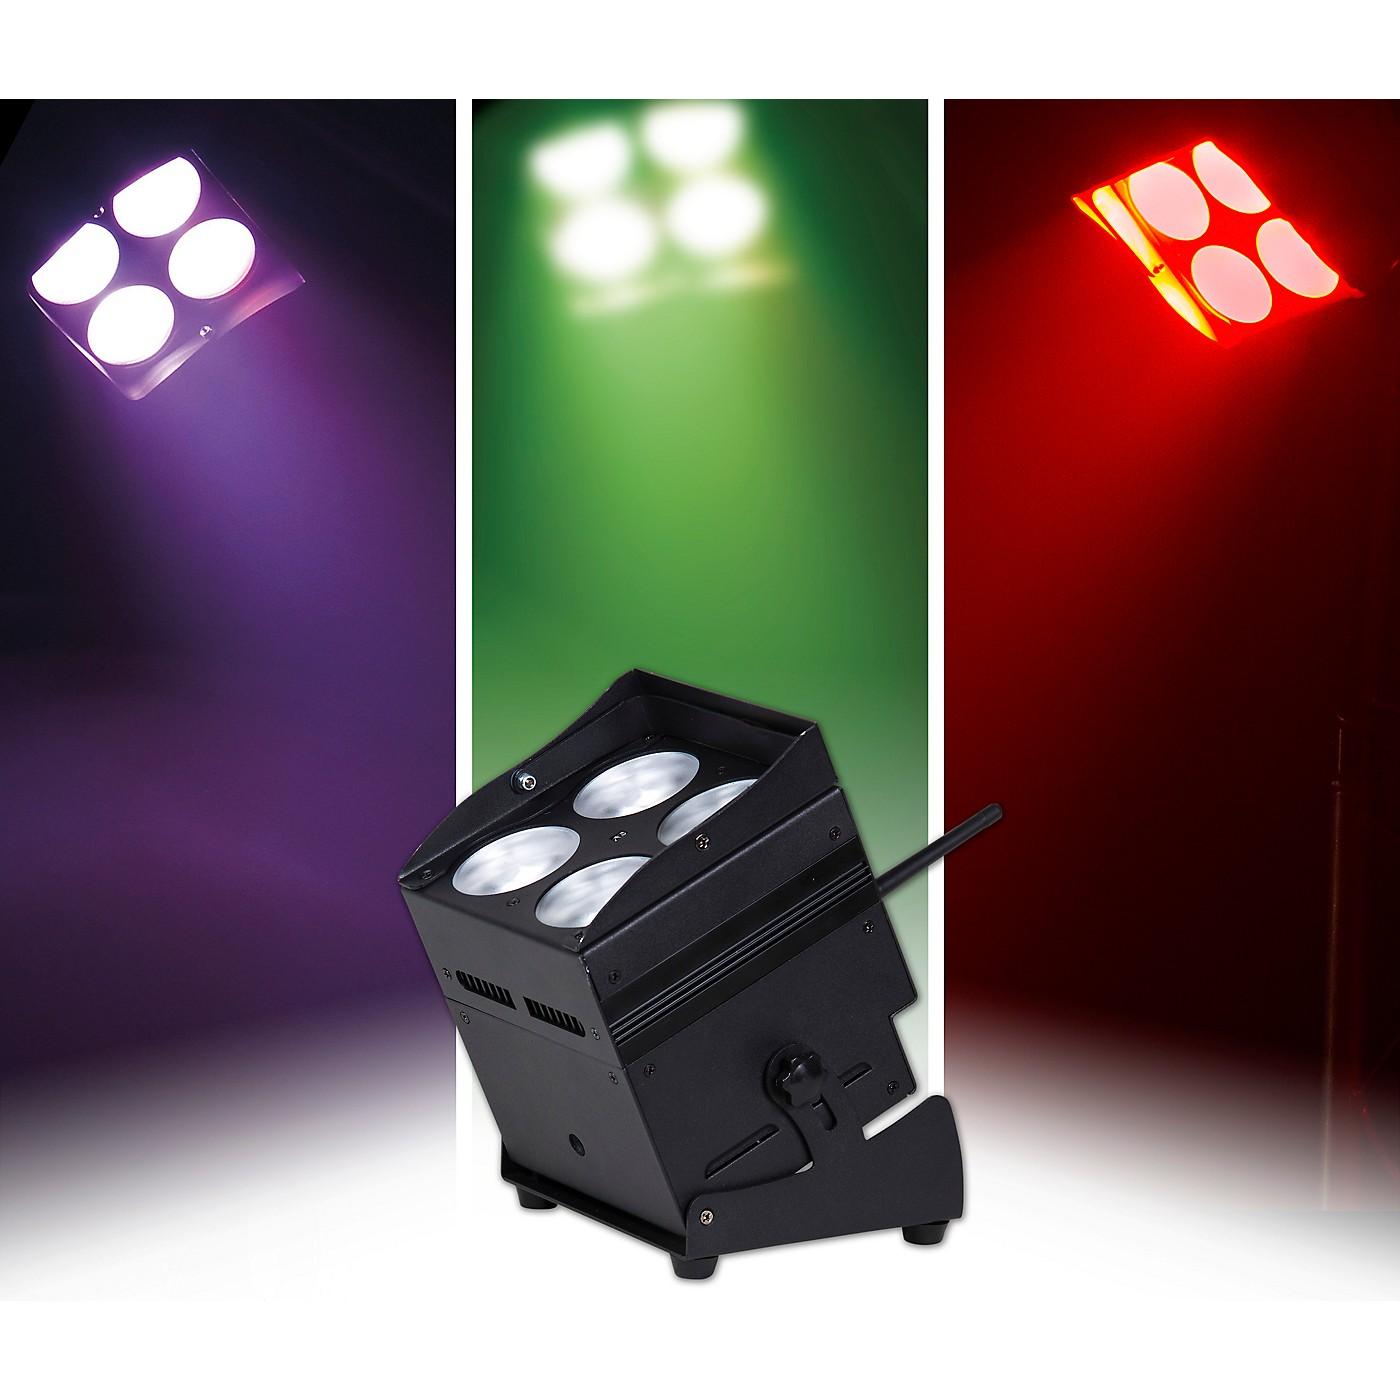 ColorKey MobilePar QUAD 4 2.4GHz W-DMX Wireless, Cordless RGBAW+UV LED PAR Wash Light thumbnail